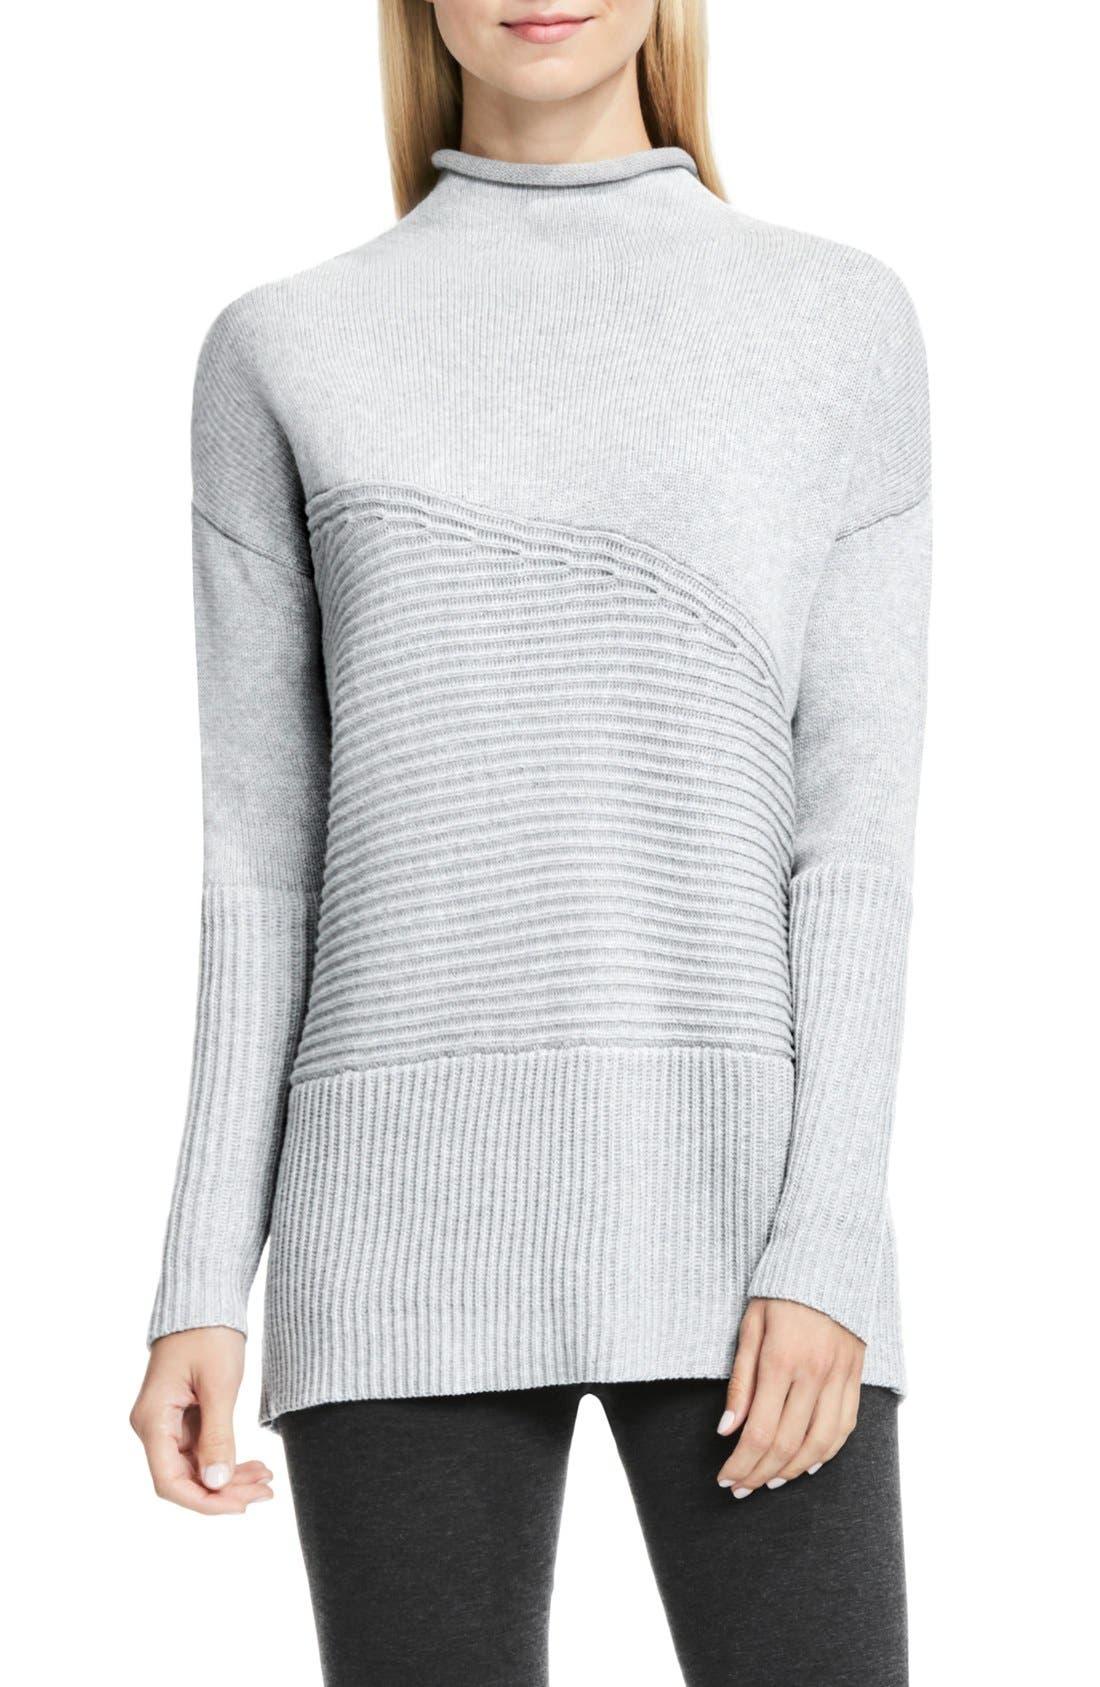 Alternate Image 1 Selected - Vince Camuto Rib Knit Turtleneck Sweater (Regular & Petite)